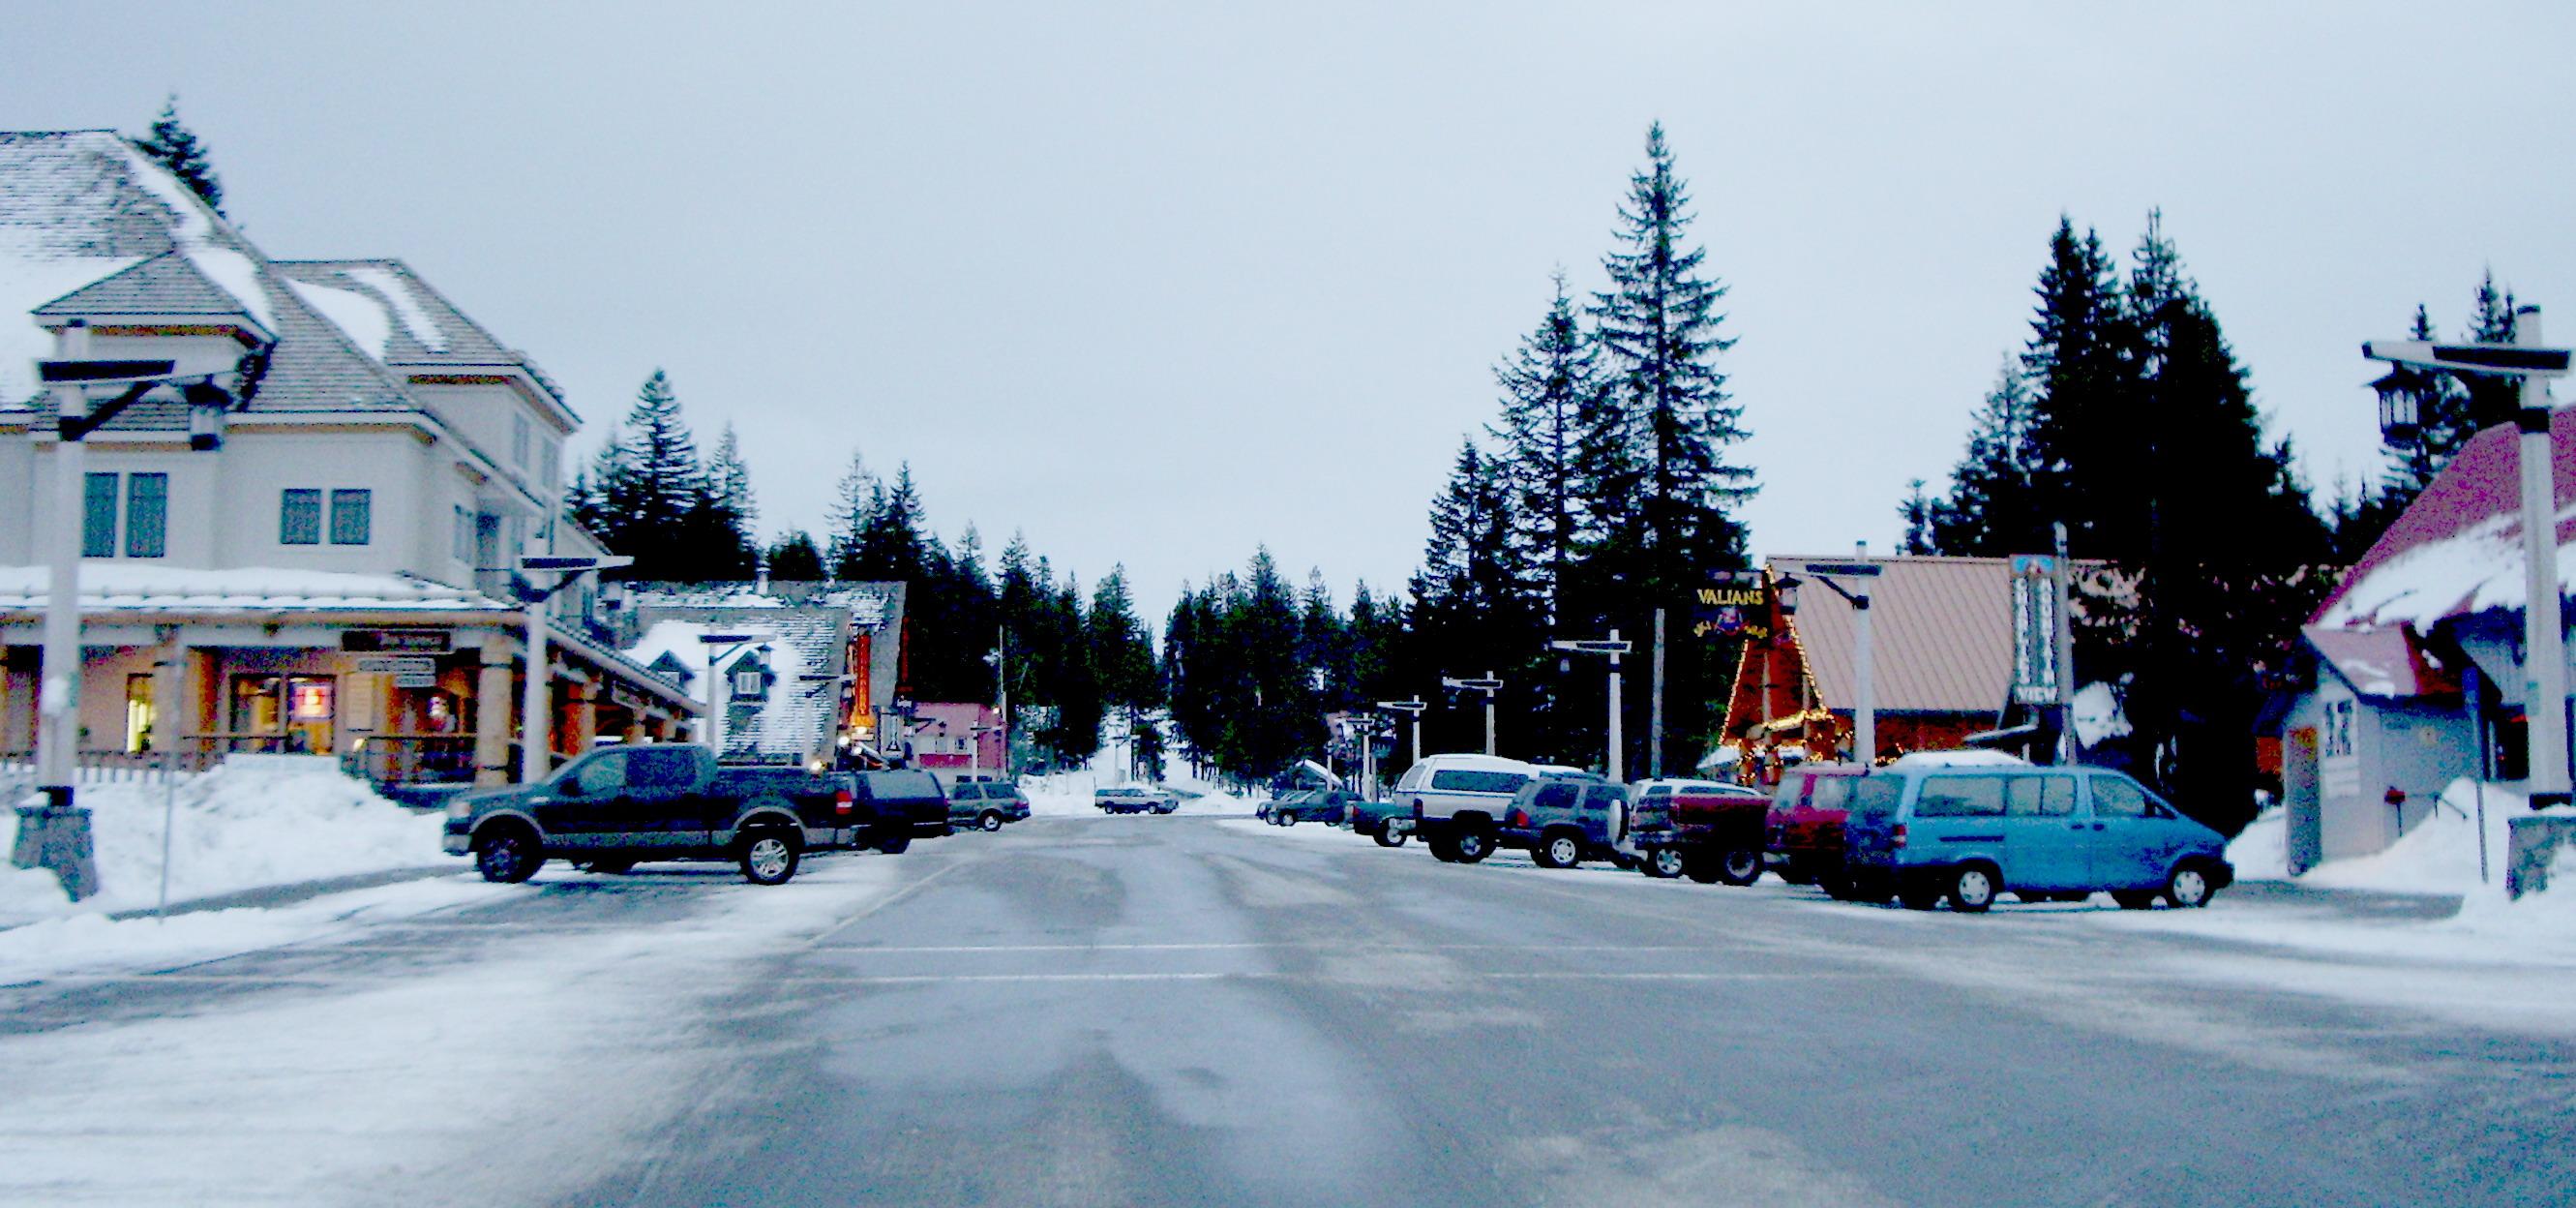 government Camp Oregon